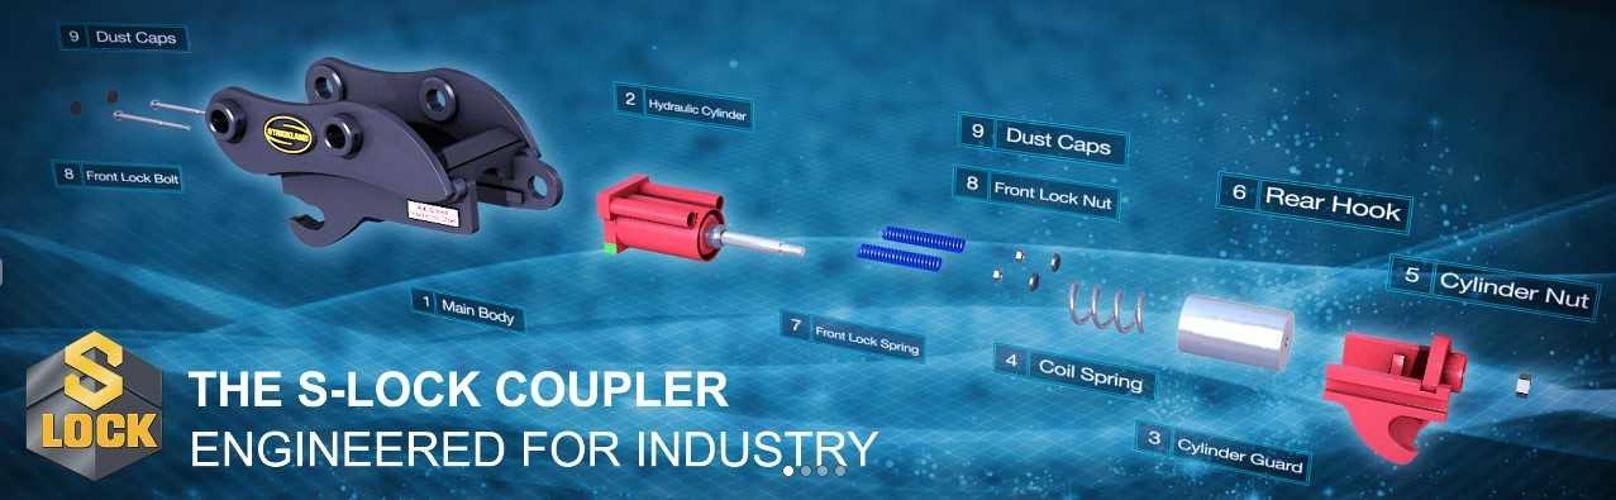 coupleur hydraulique S-LOCK slock1